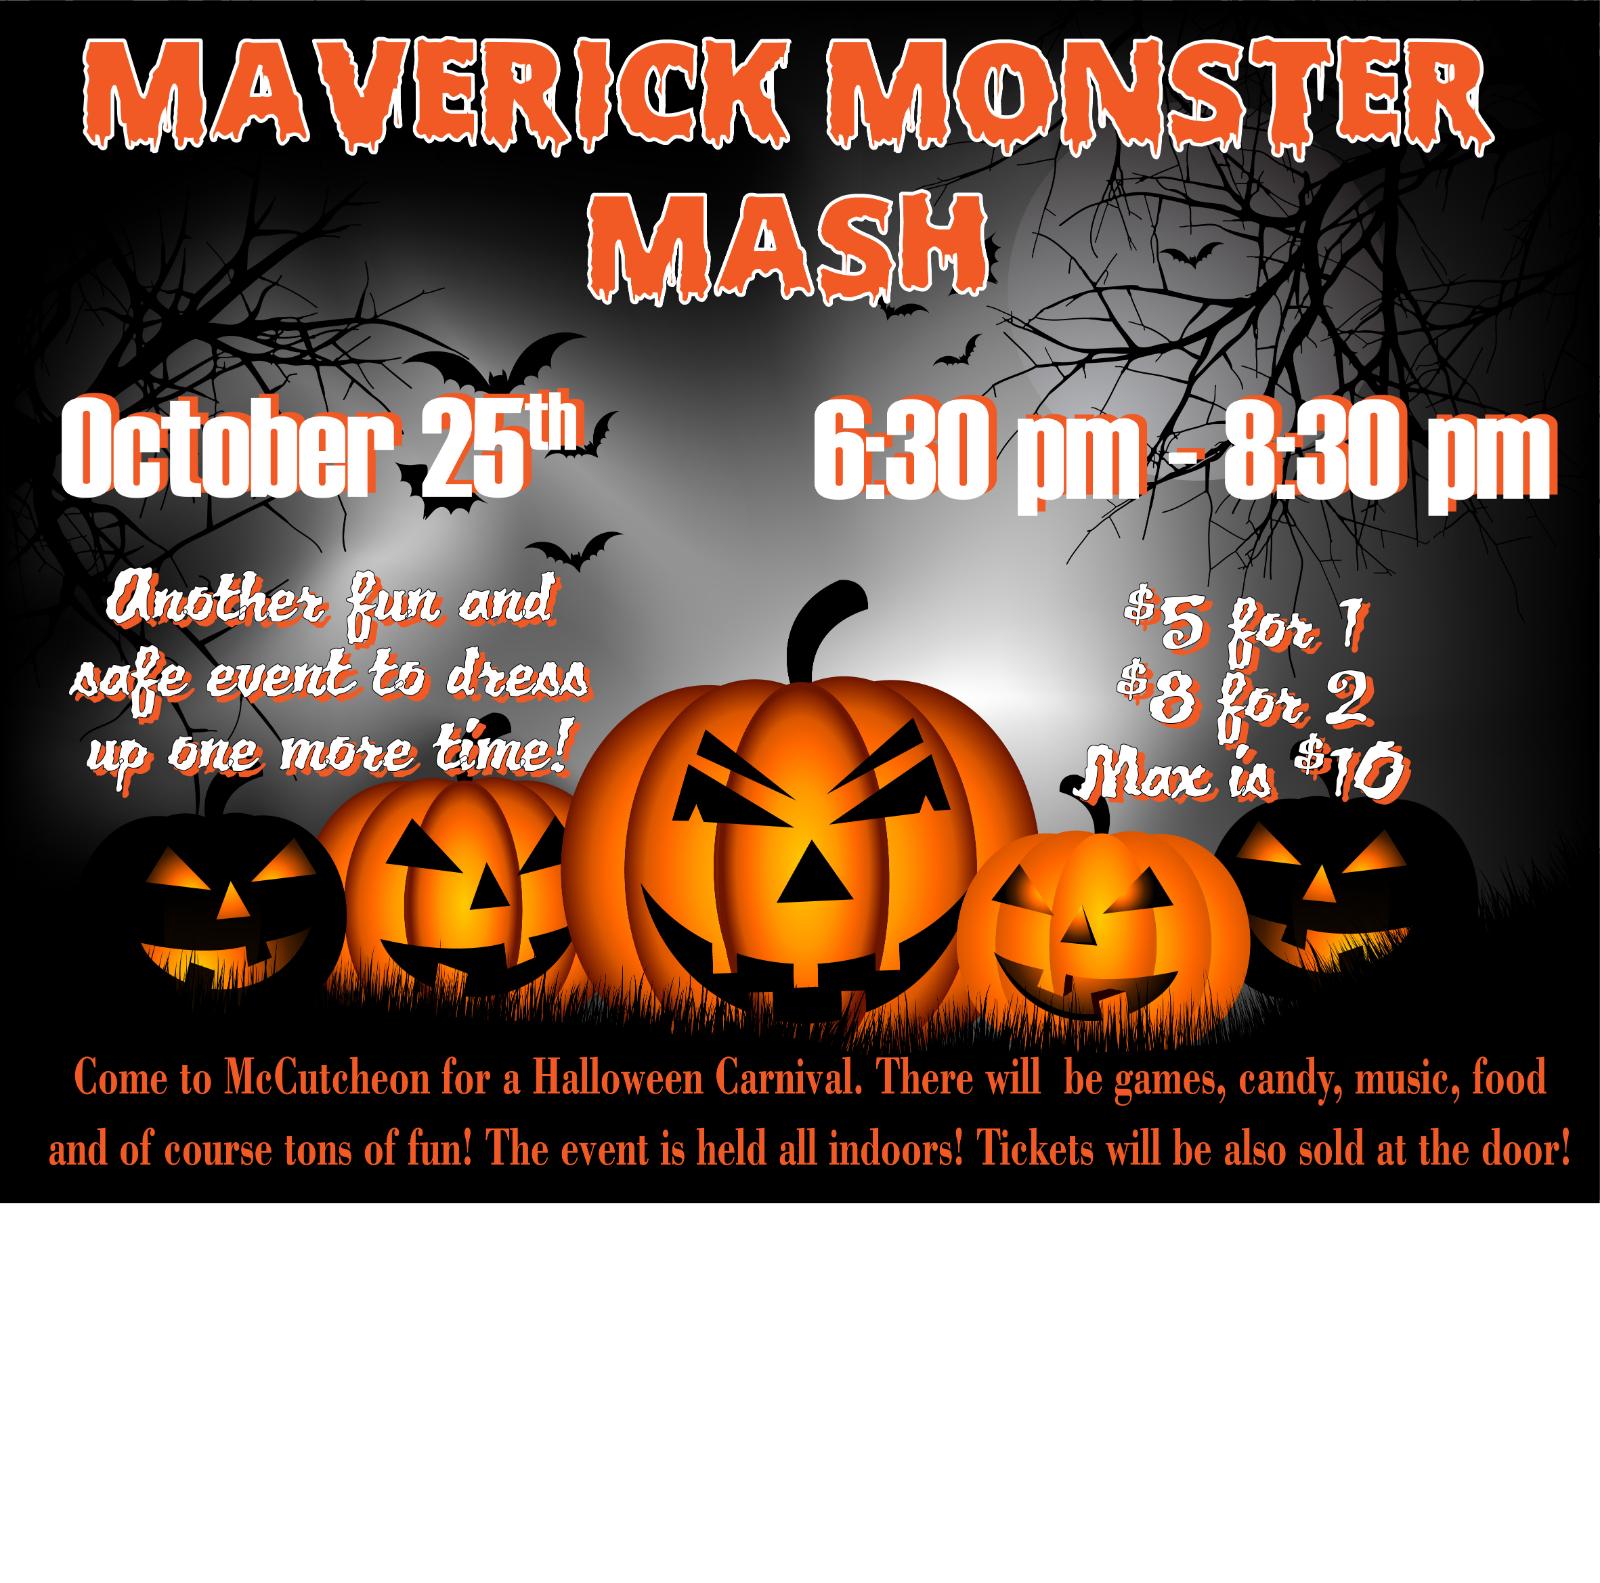 Annual Maverick Monster Mash – Friday Oct. 25th